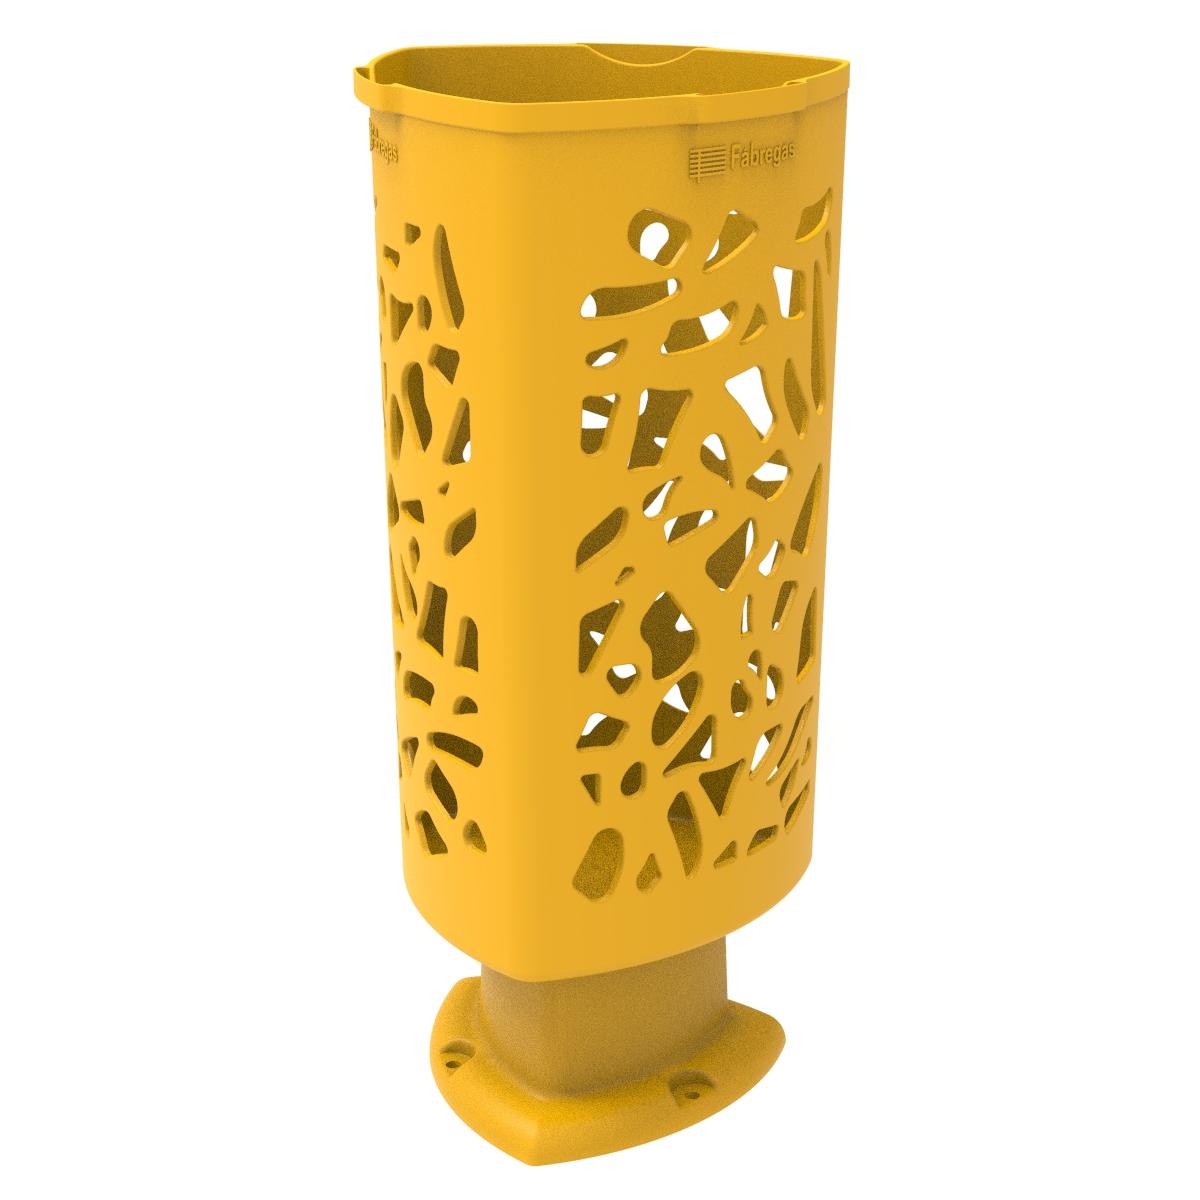 Papelera Scuderia de Polietileno color Amarilo RAL 1023 para Calle